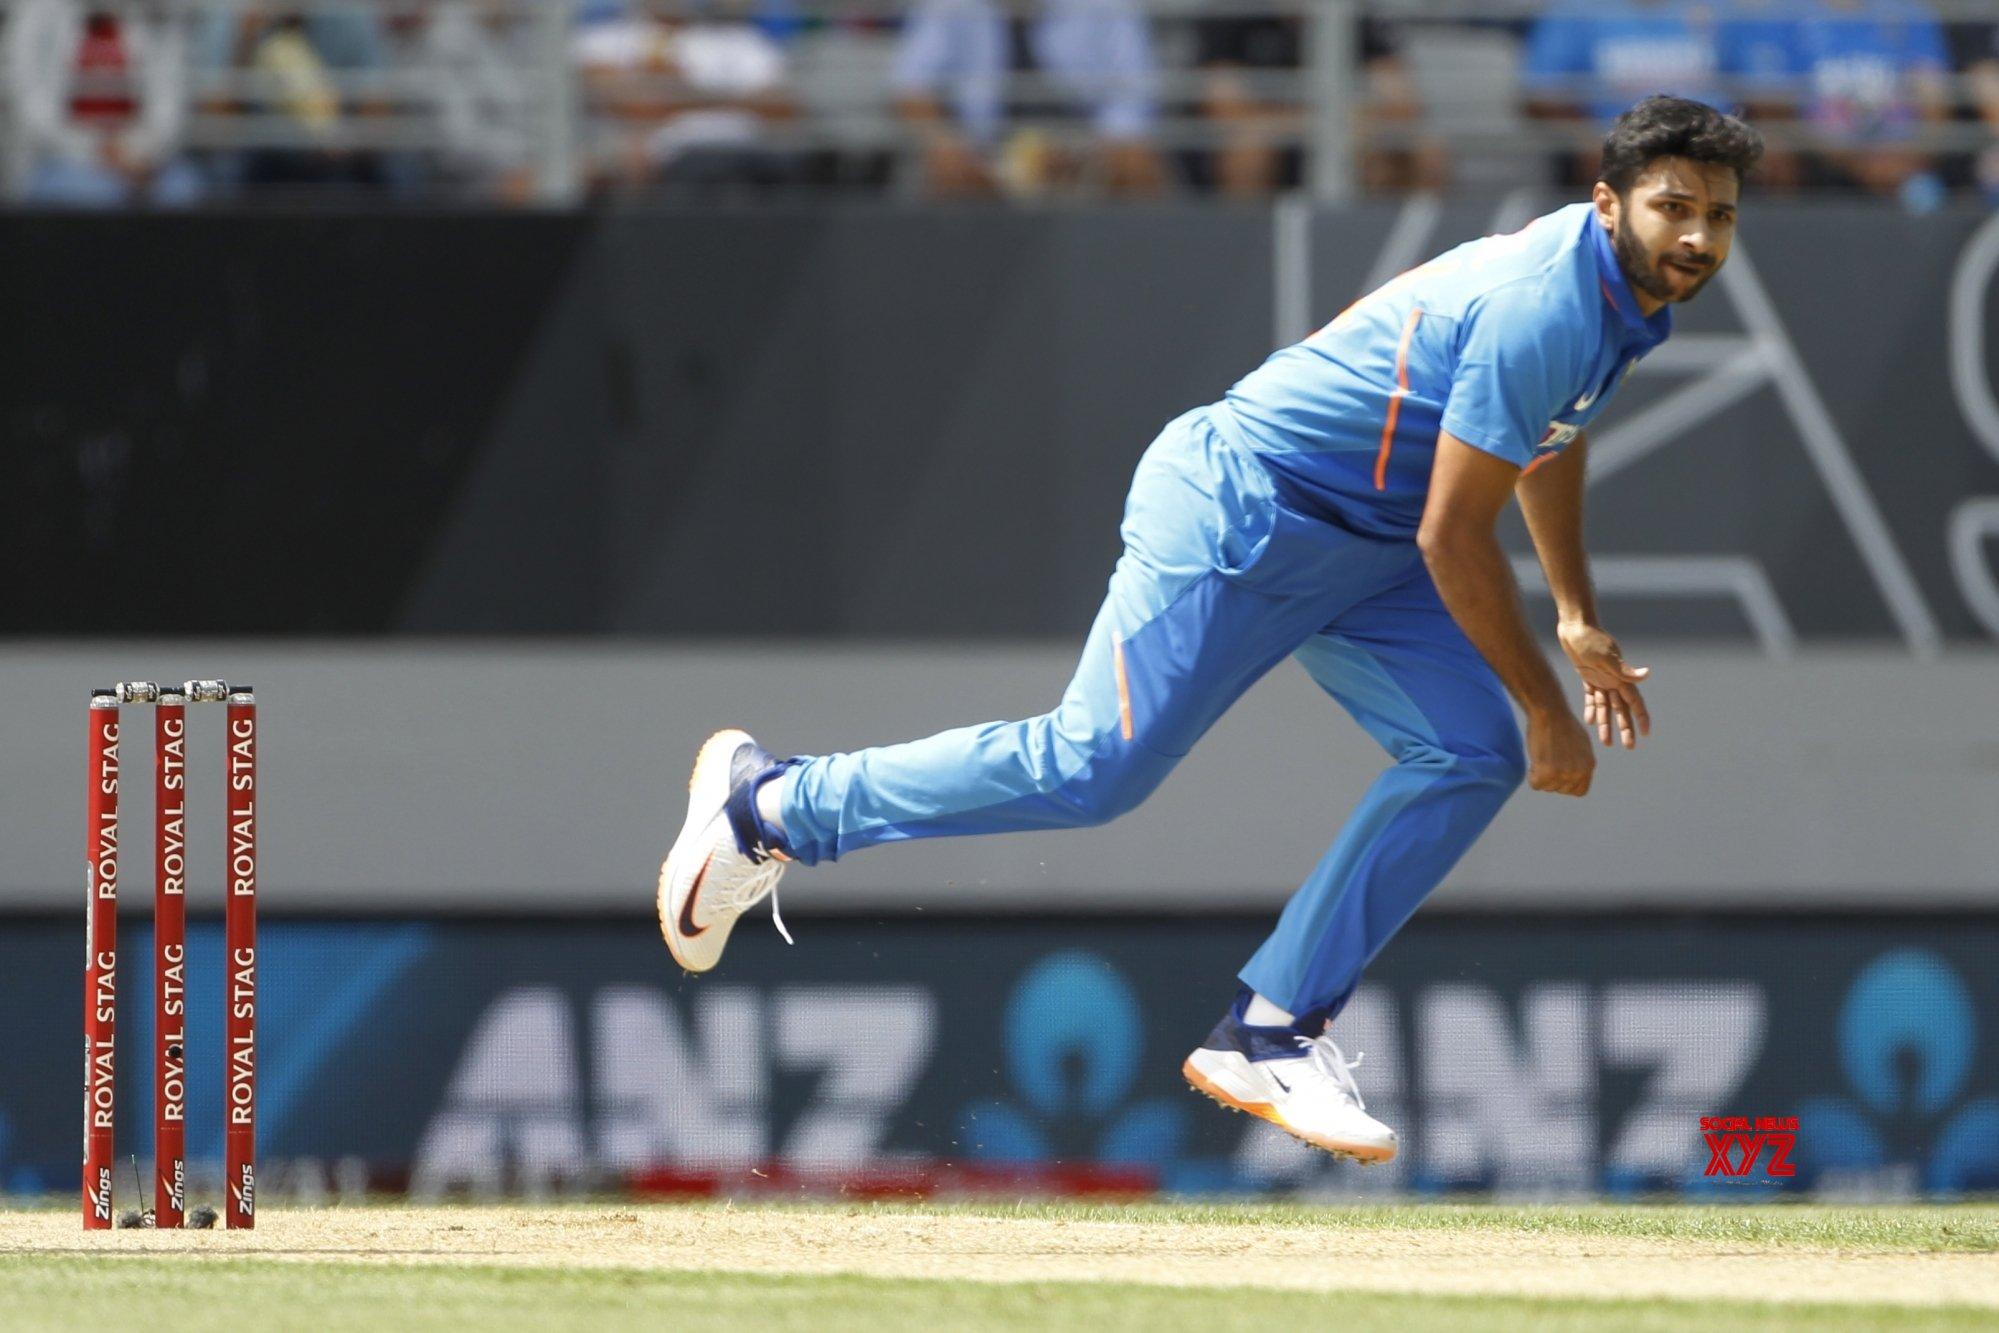 Auckland: 2nd ODI - India Vs New Zealand (Batch - 3) #Gallery